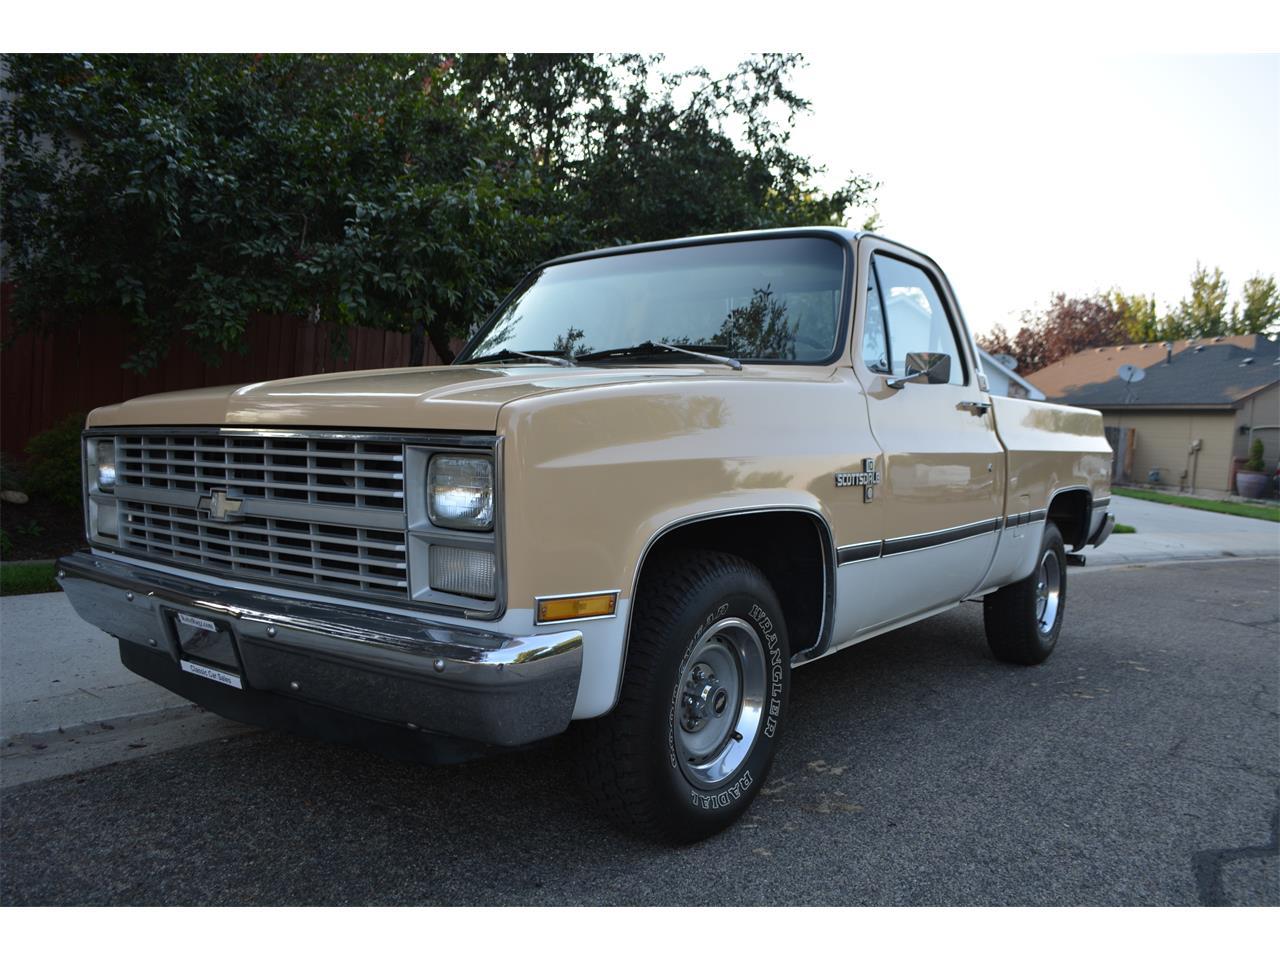 1983 Chevrolet Scottsdale For Sale Cc 1038794 Chevy Silverado Crew Cab Large Picture Of 83 M9je